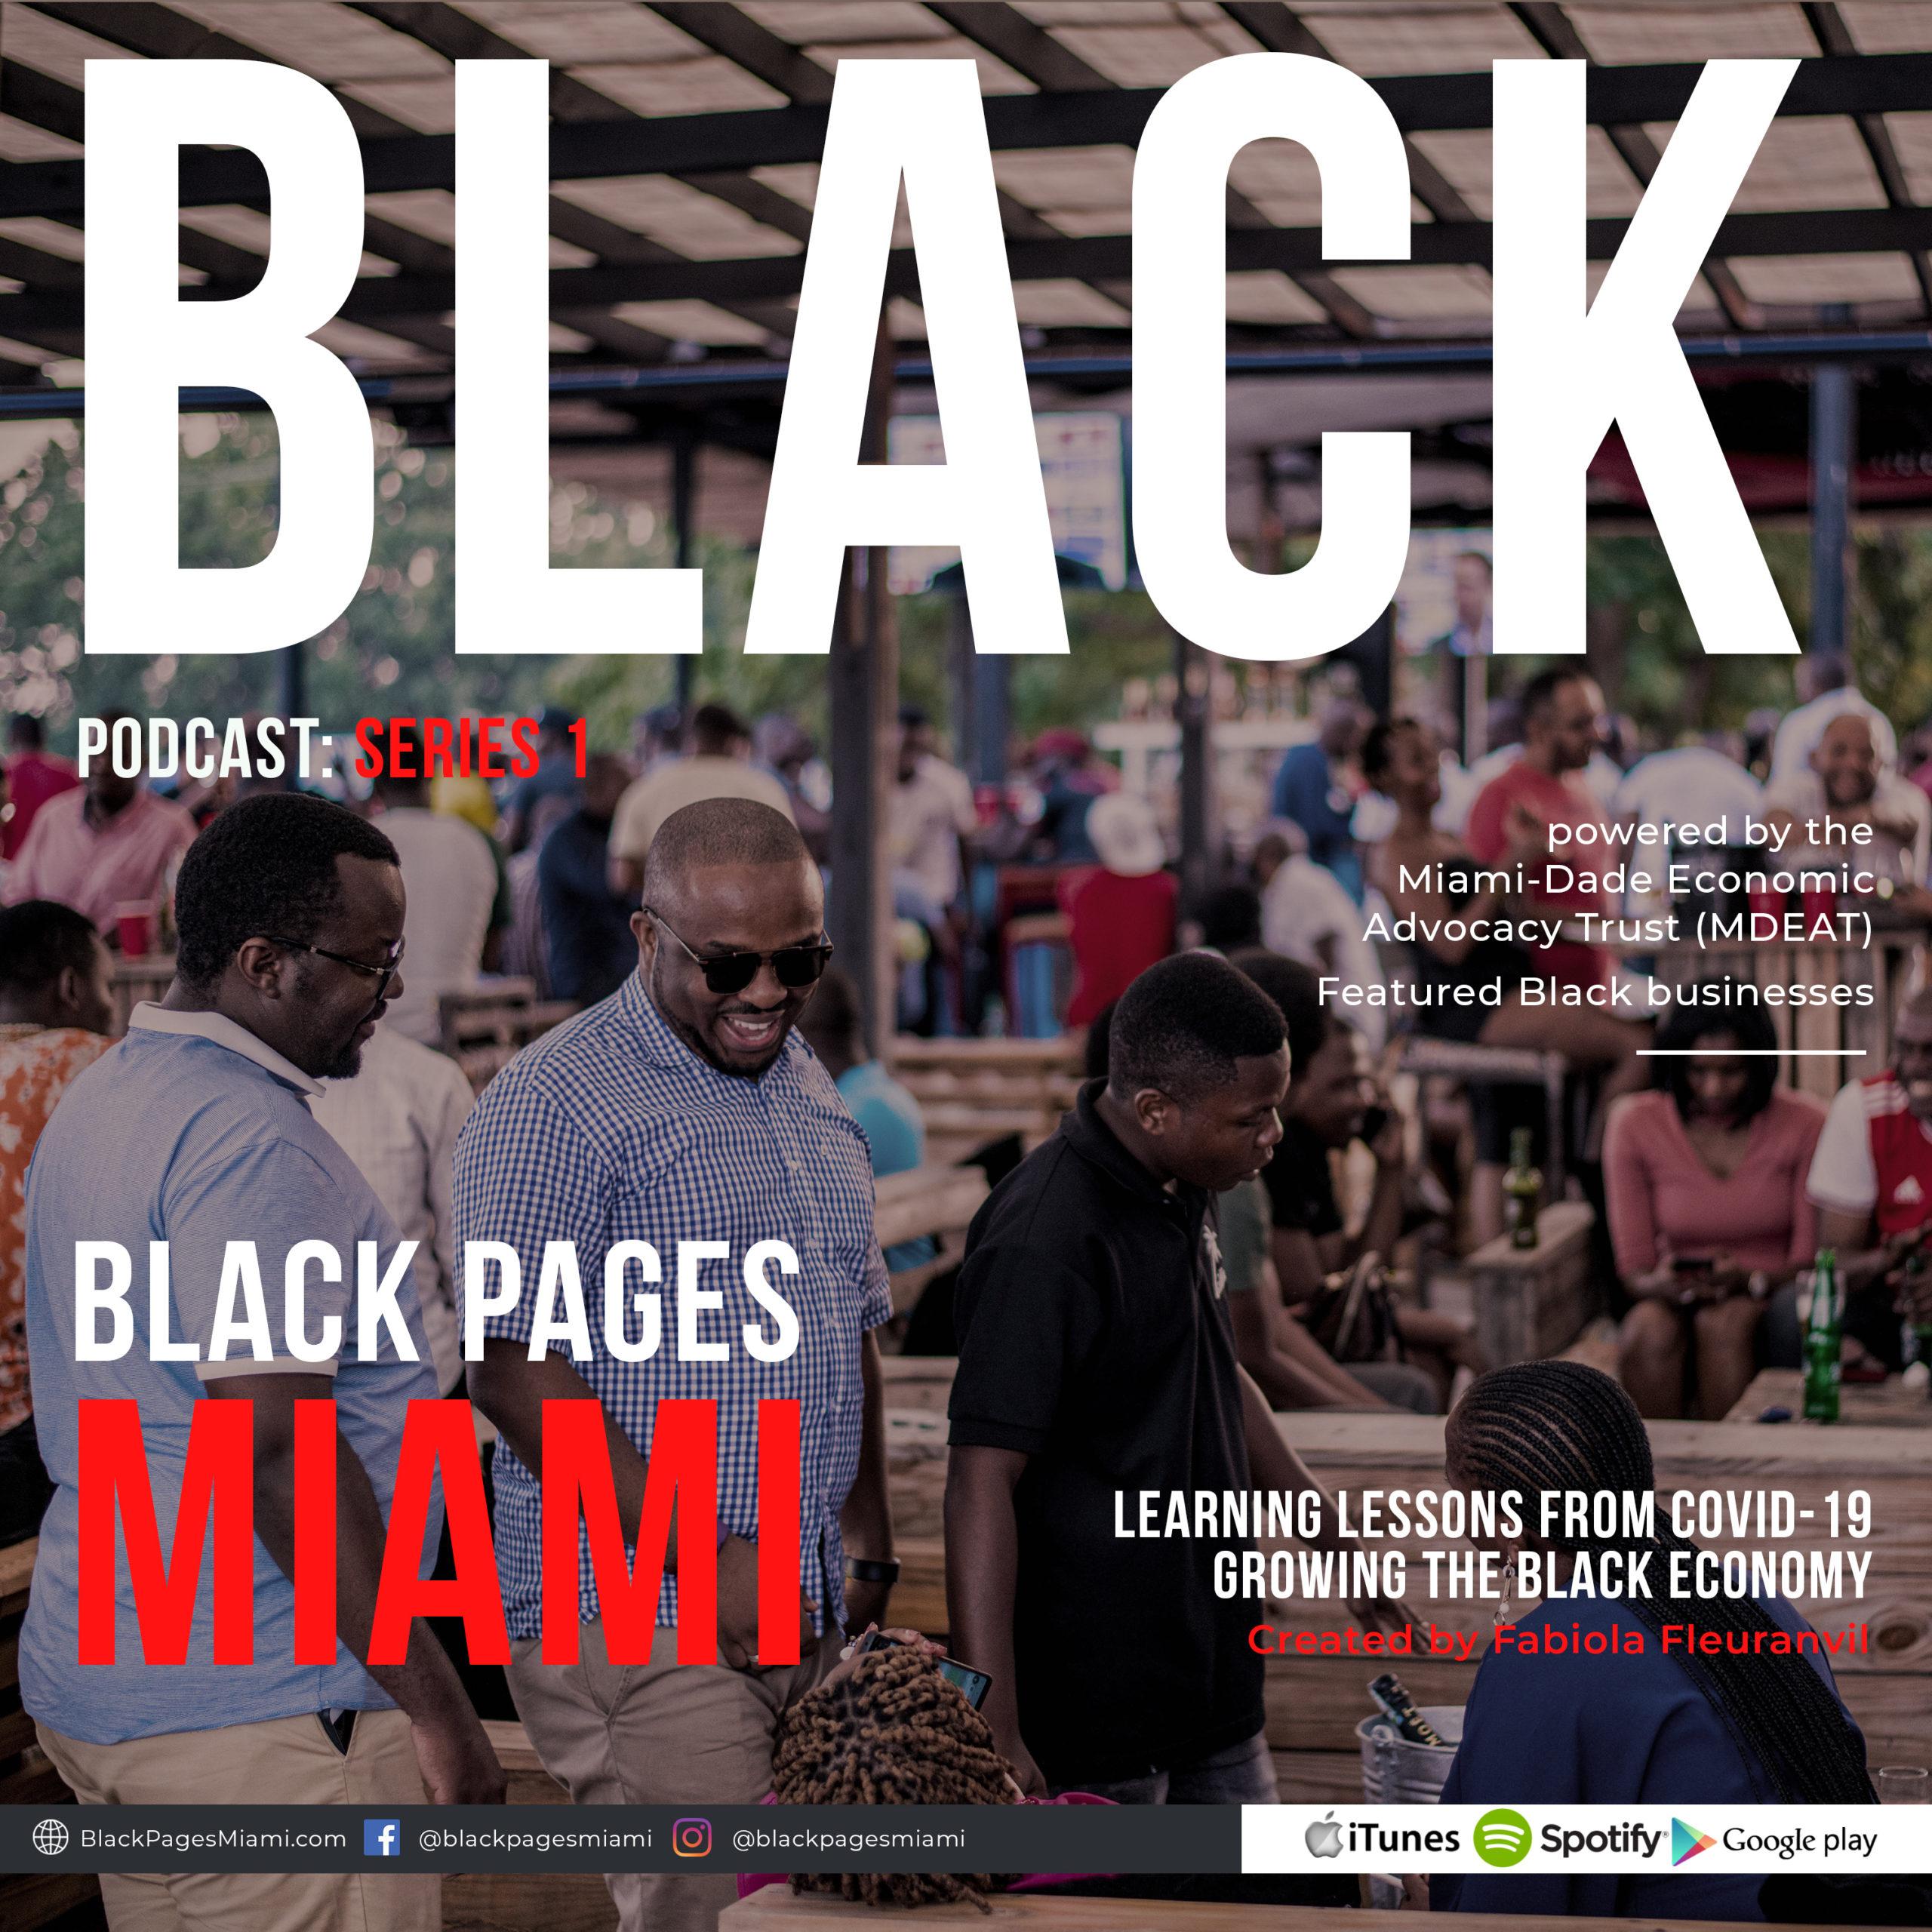 Black Business podcast